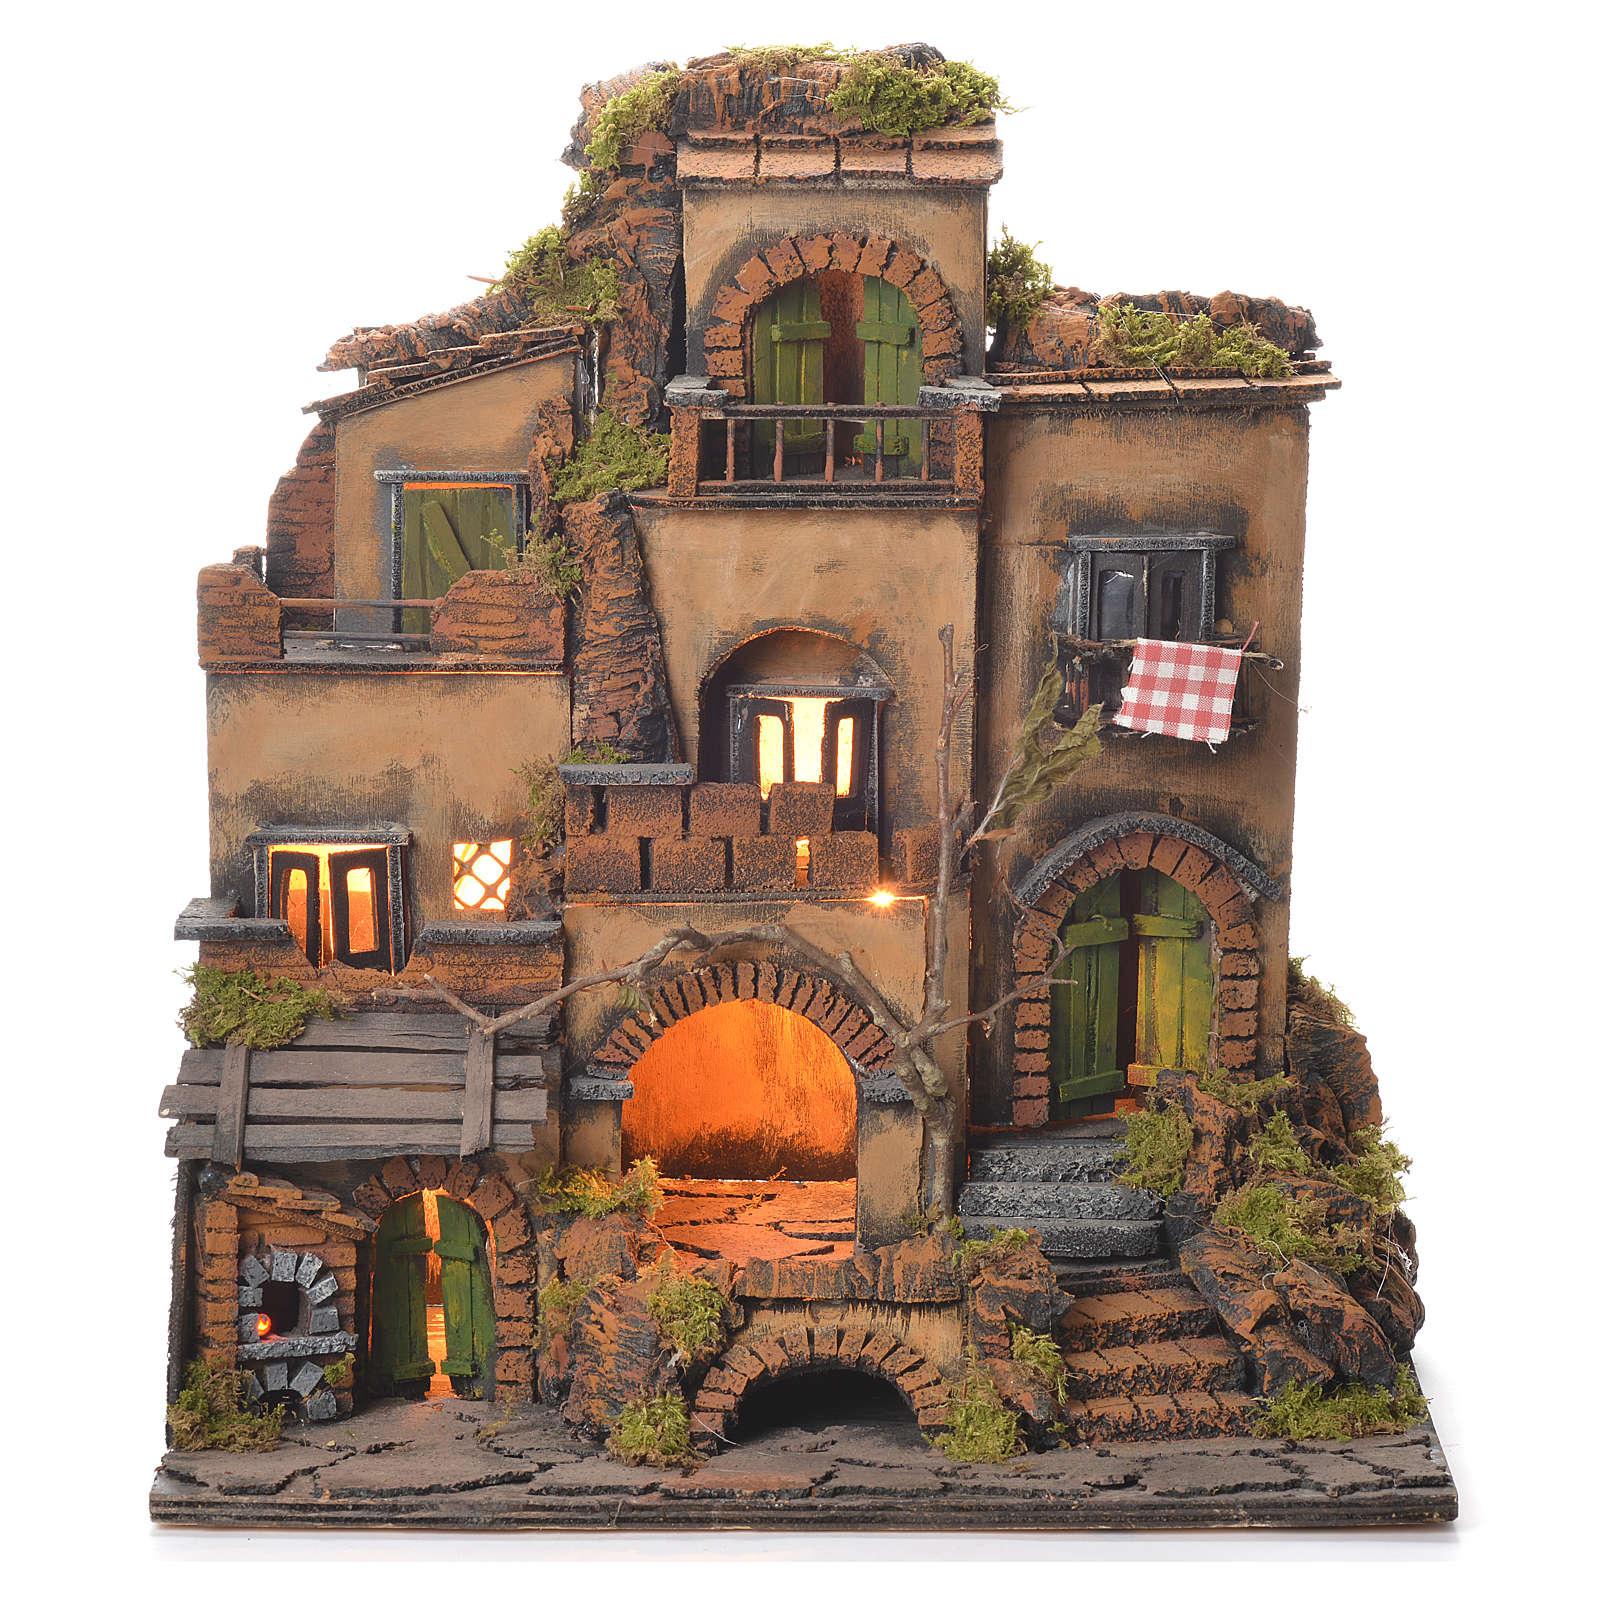 Borgo presepe stile 700 napoletano cm 45x35x33 | vendita